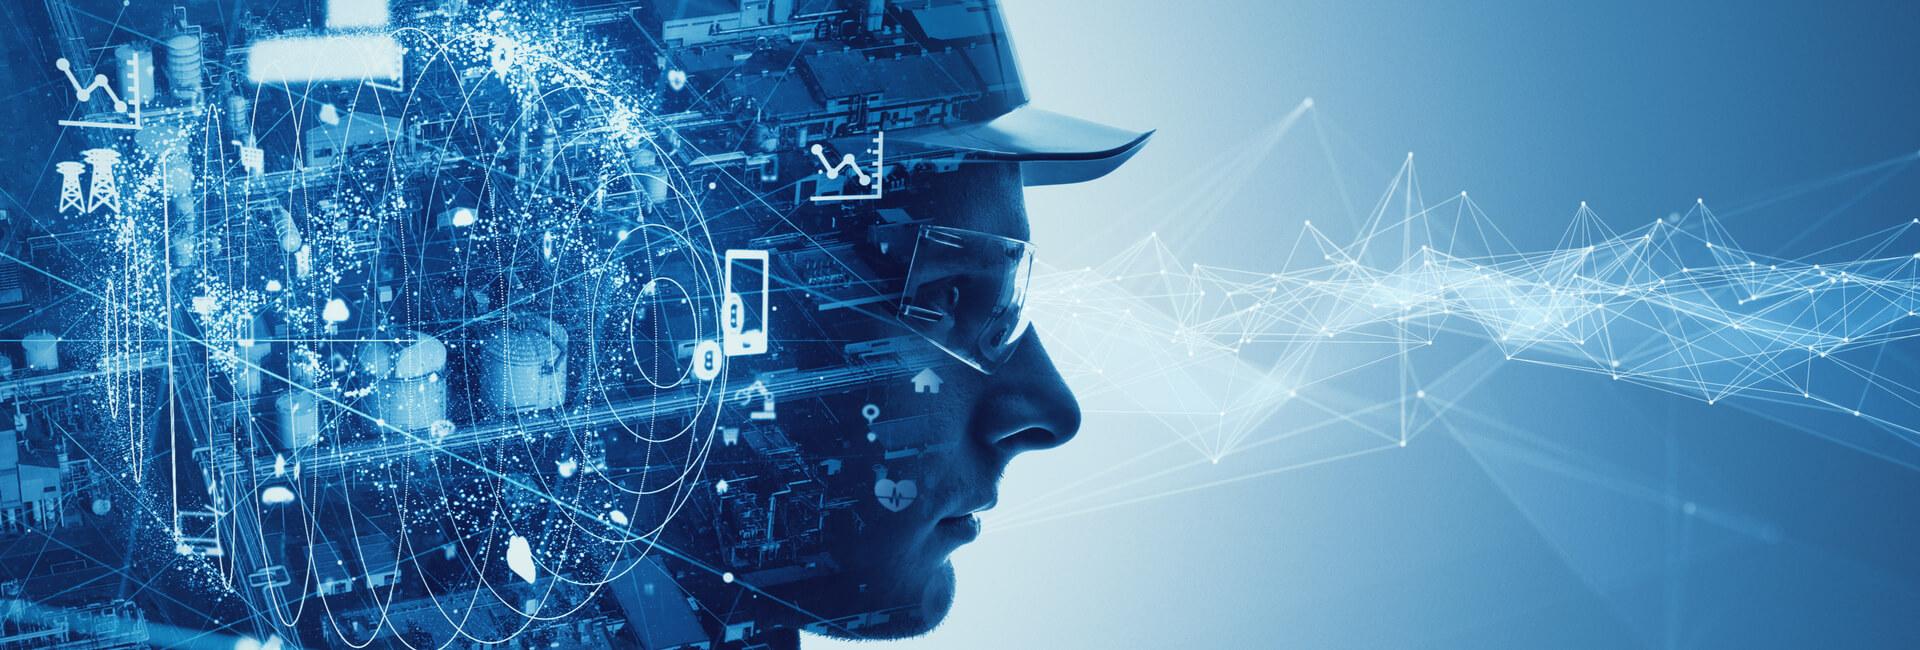 Cloud e Industria 4.0: garantire cyber sicurezza e continuità operativa